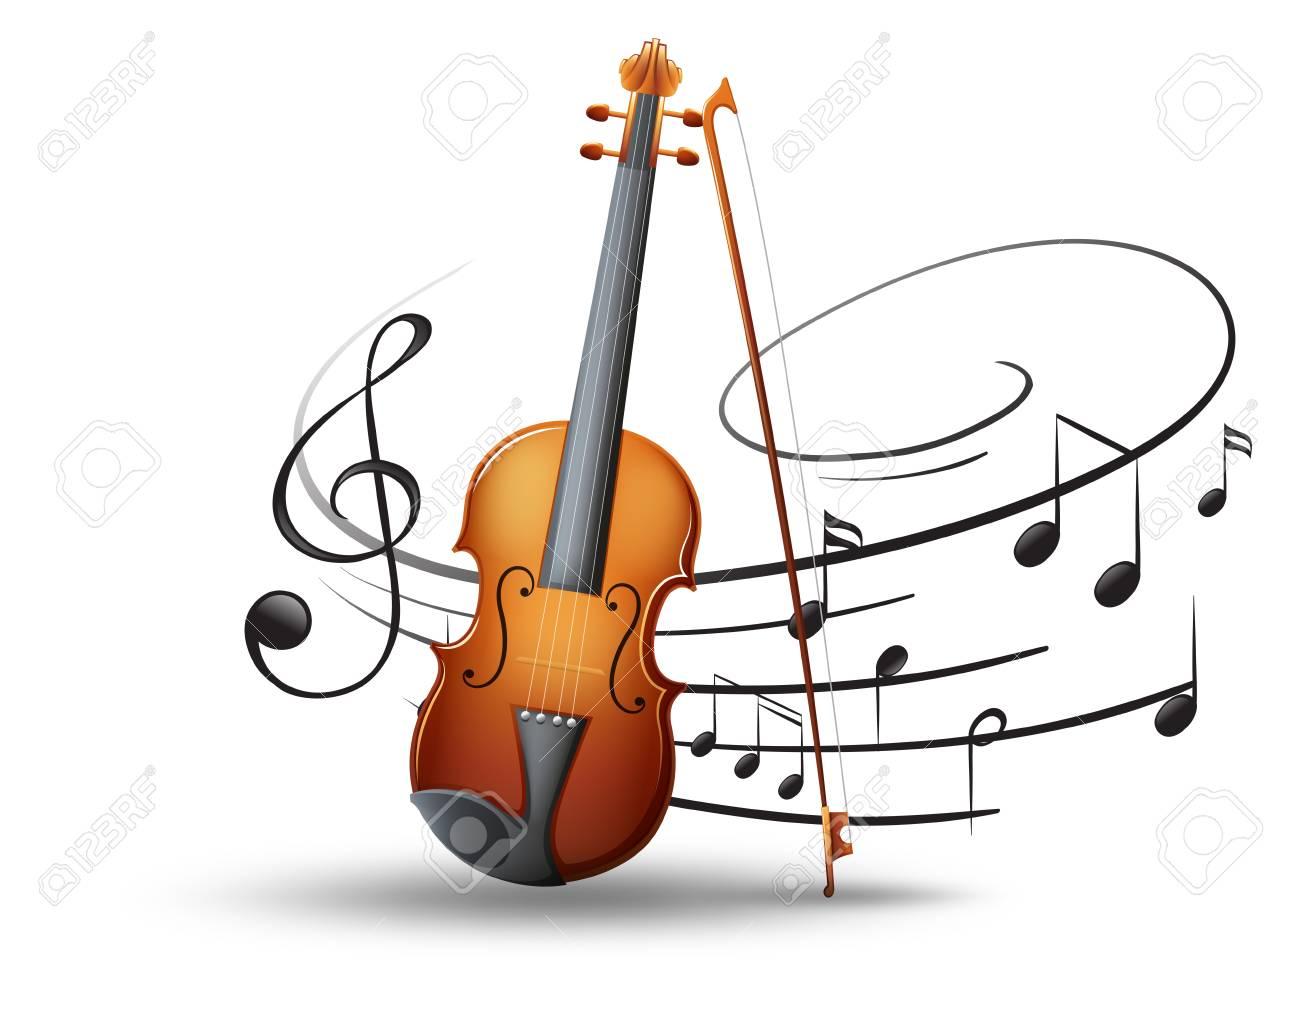 Violin making clipart png Entertainment Cliparts Violin - Making-The-Web.com png